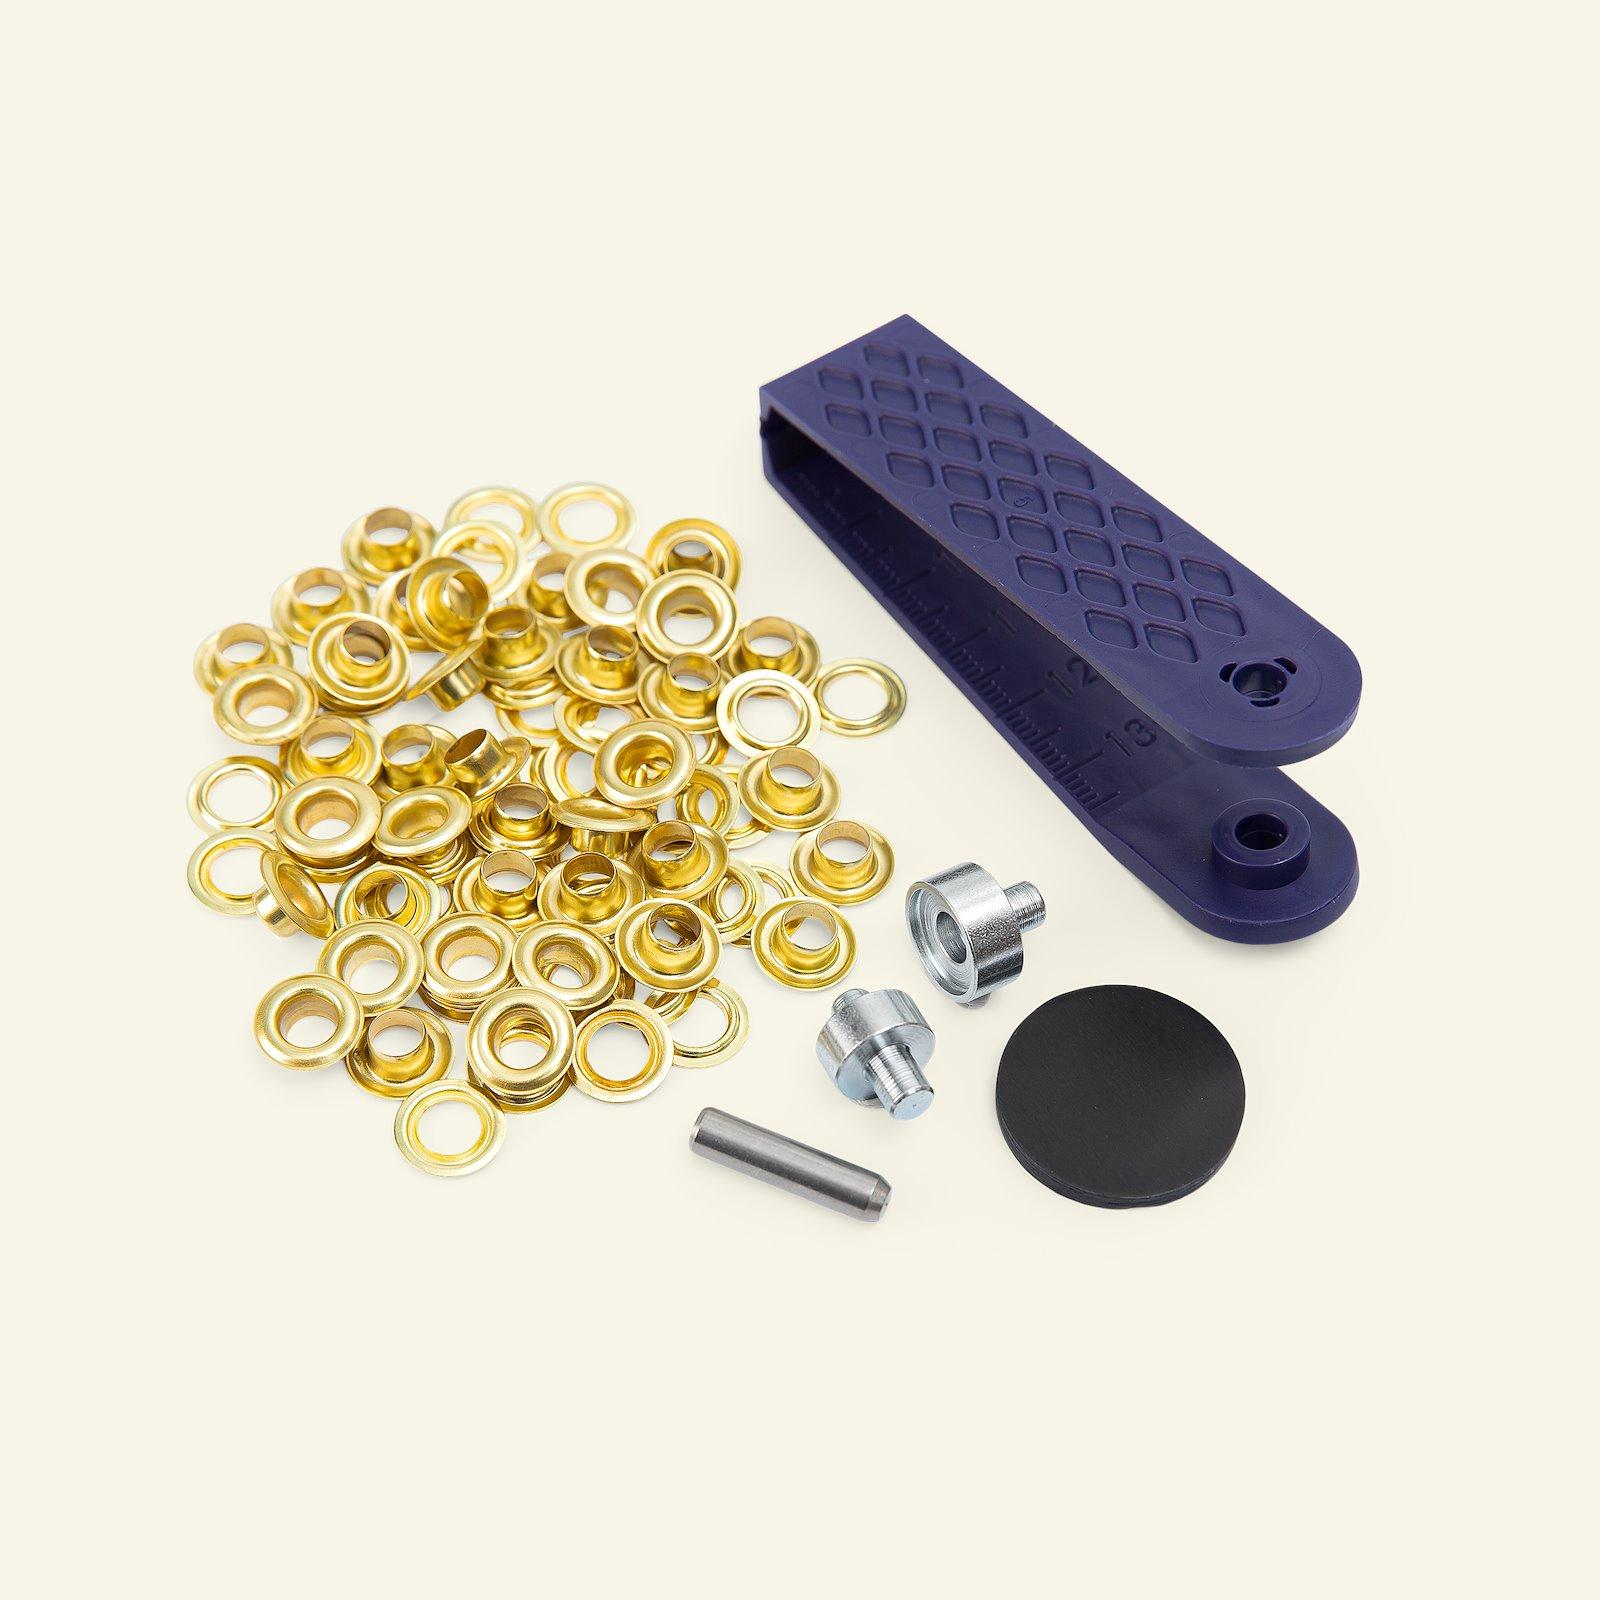 Prym eyelet w/tool 5mm gold 40pcs 44907_pack